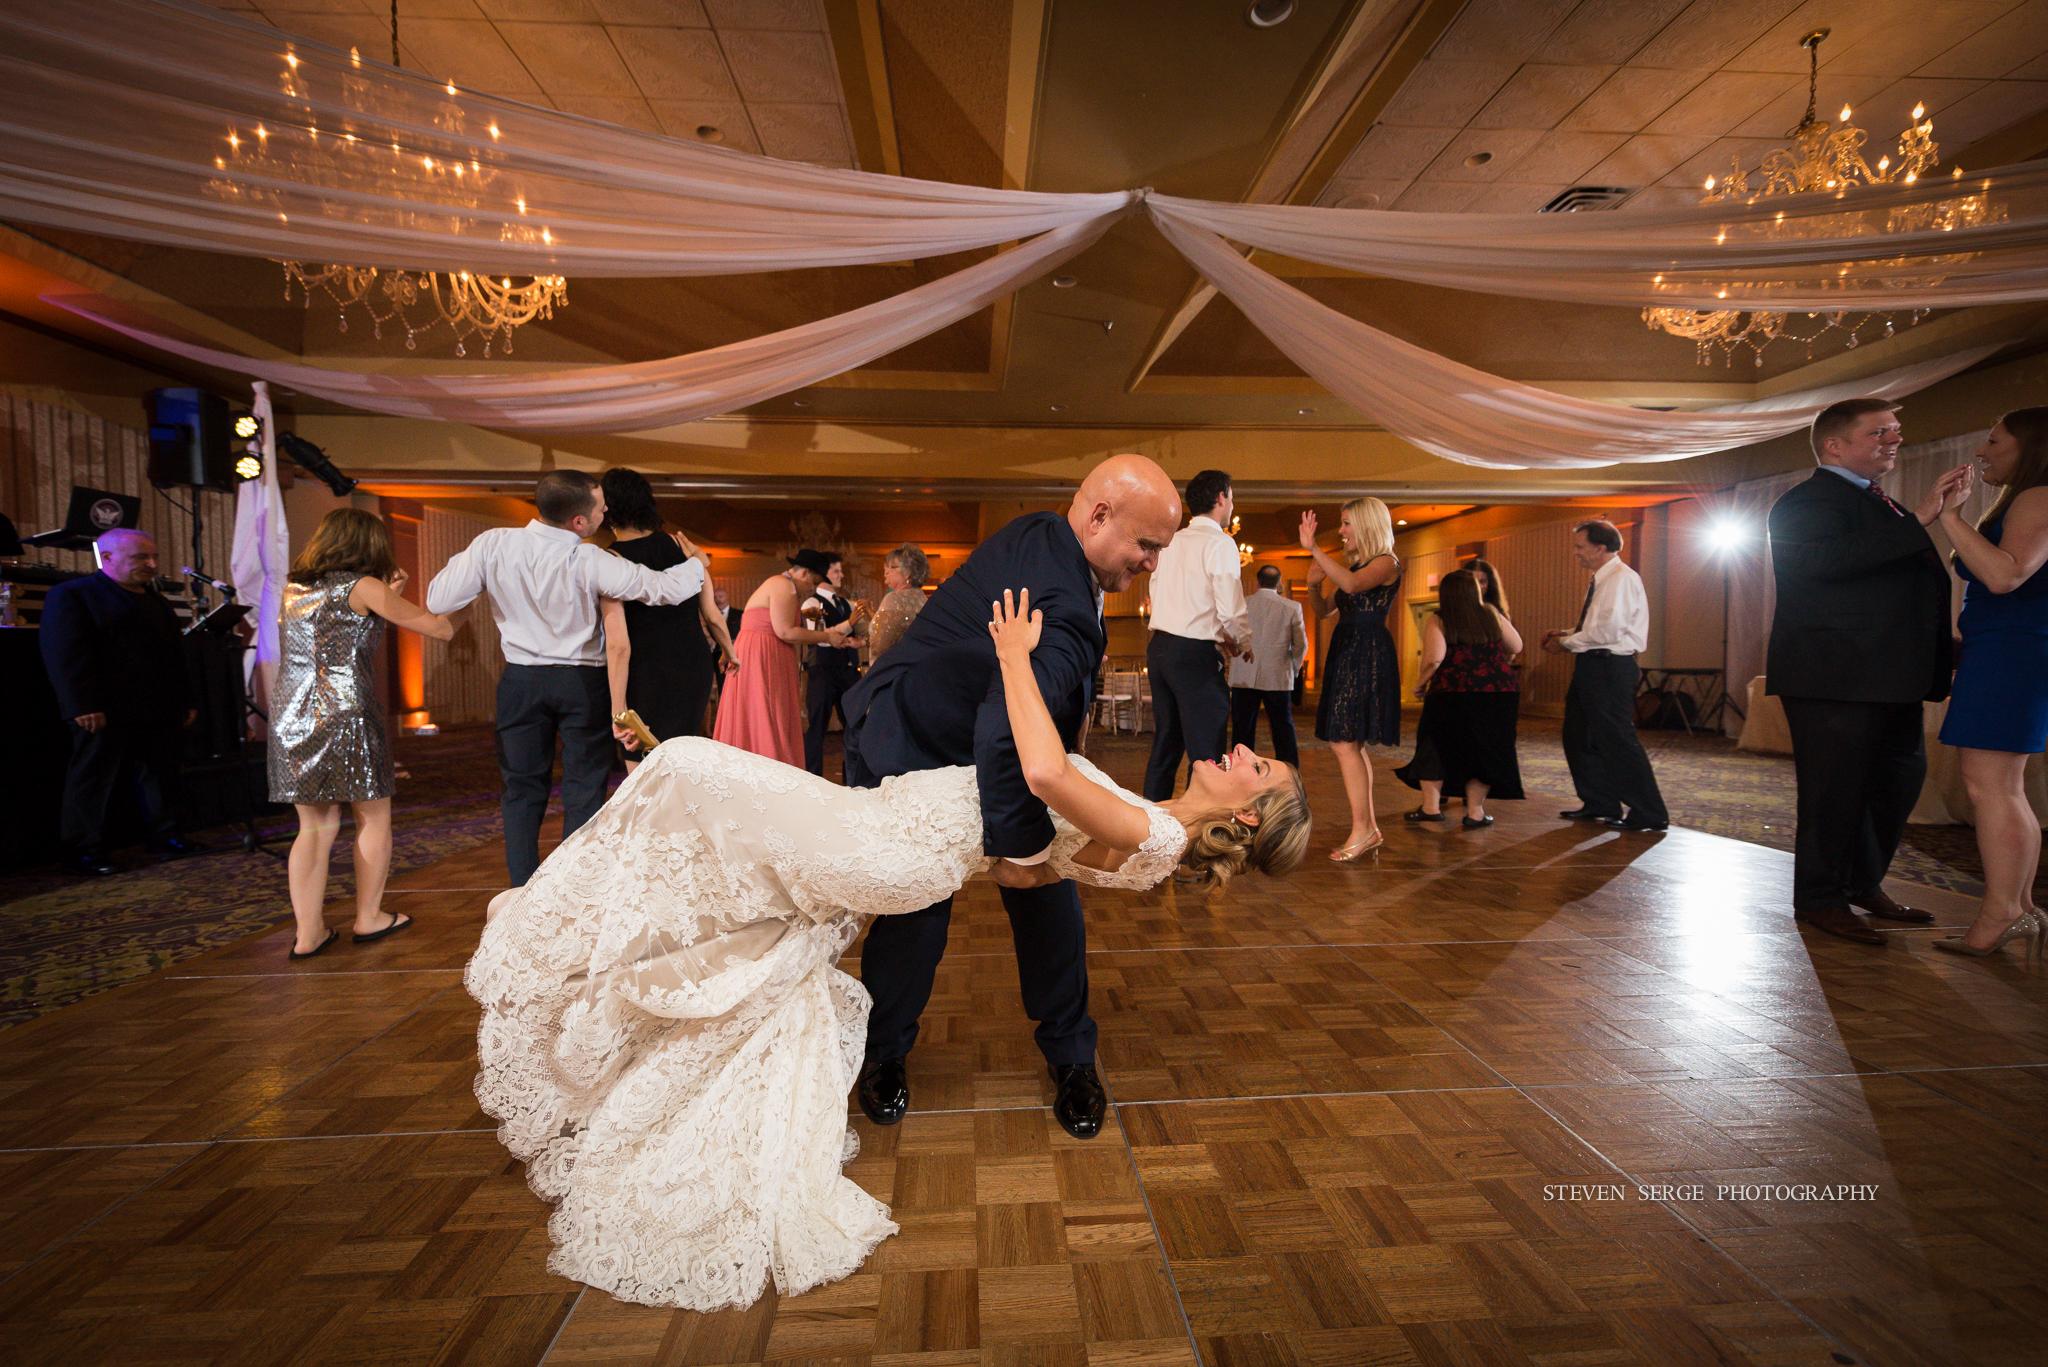 steph-scranton-wedding-steven-serge-photography-54.jpg